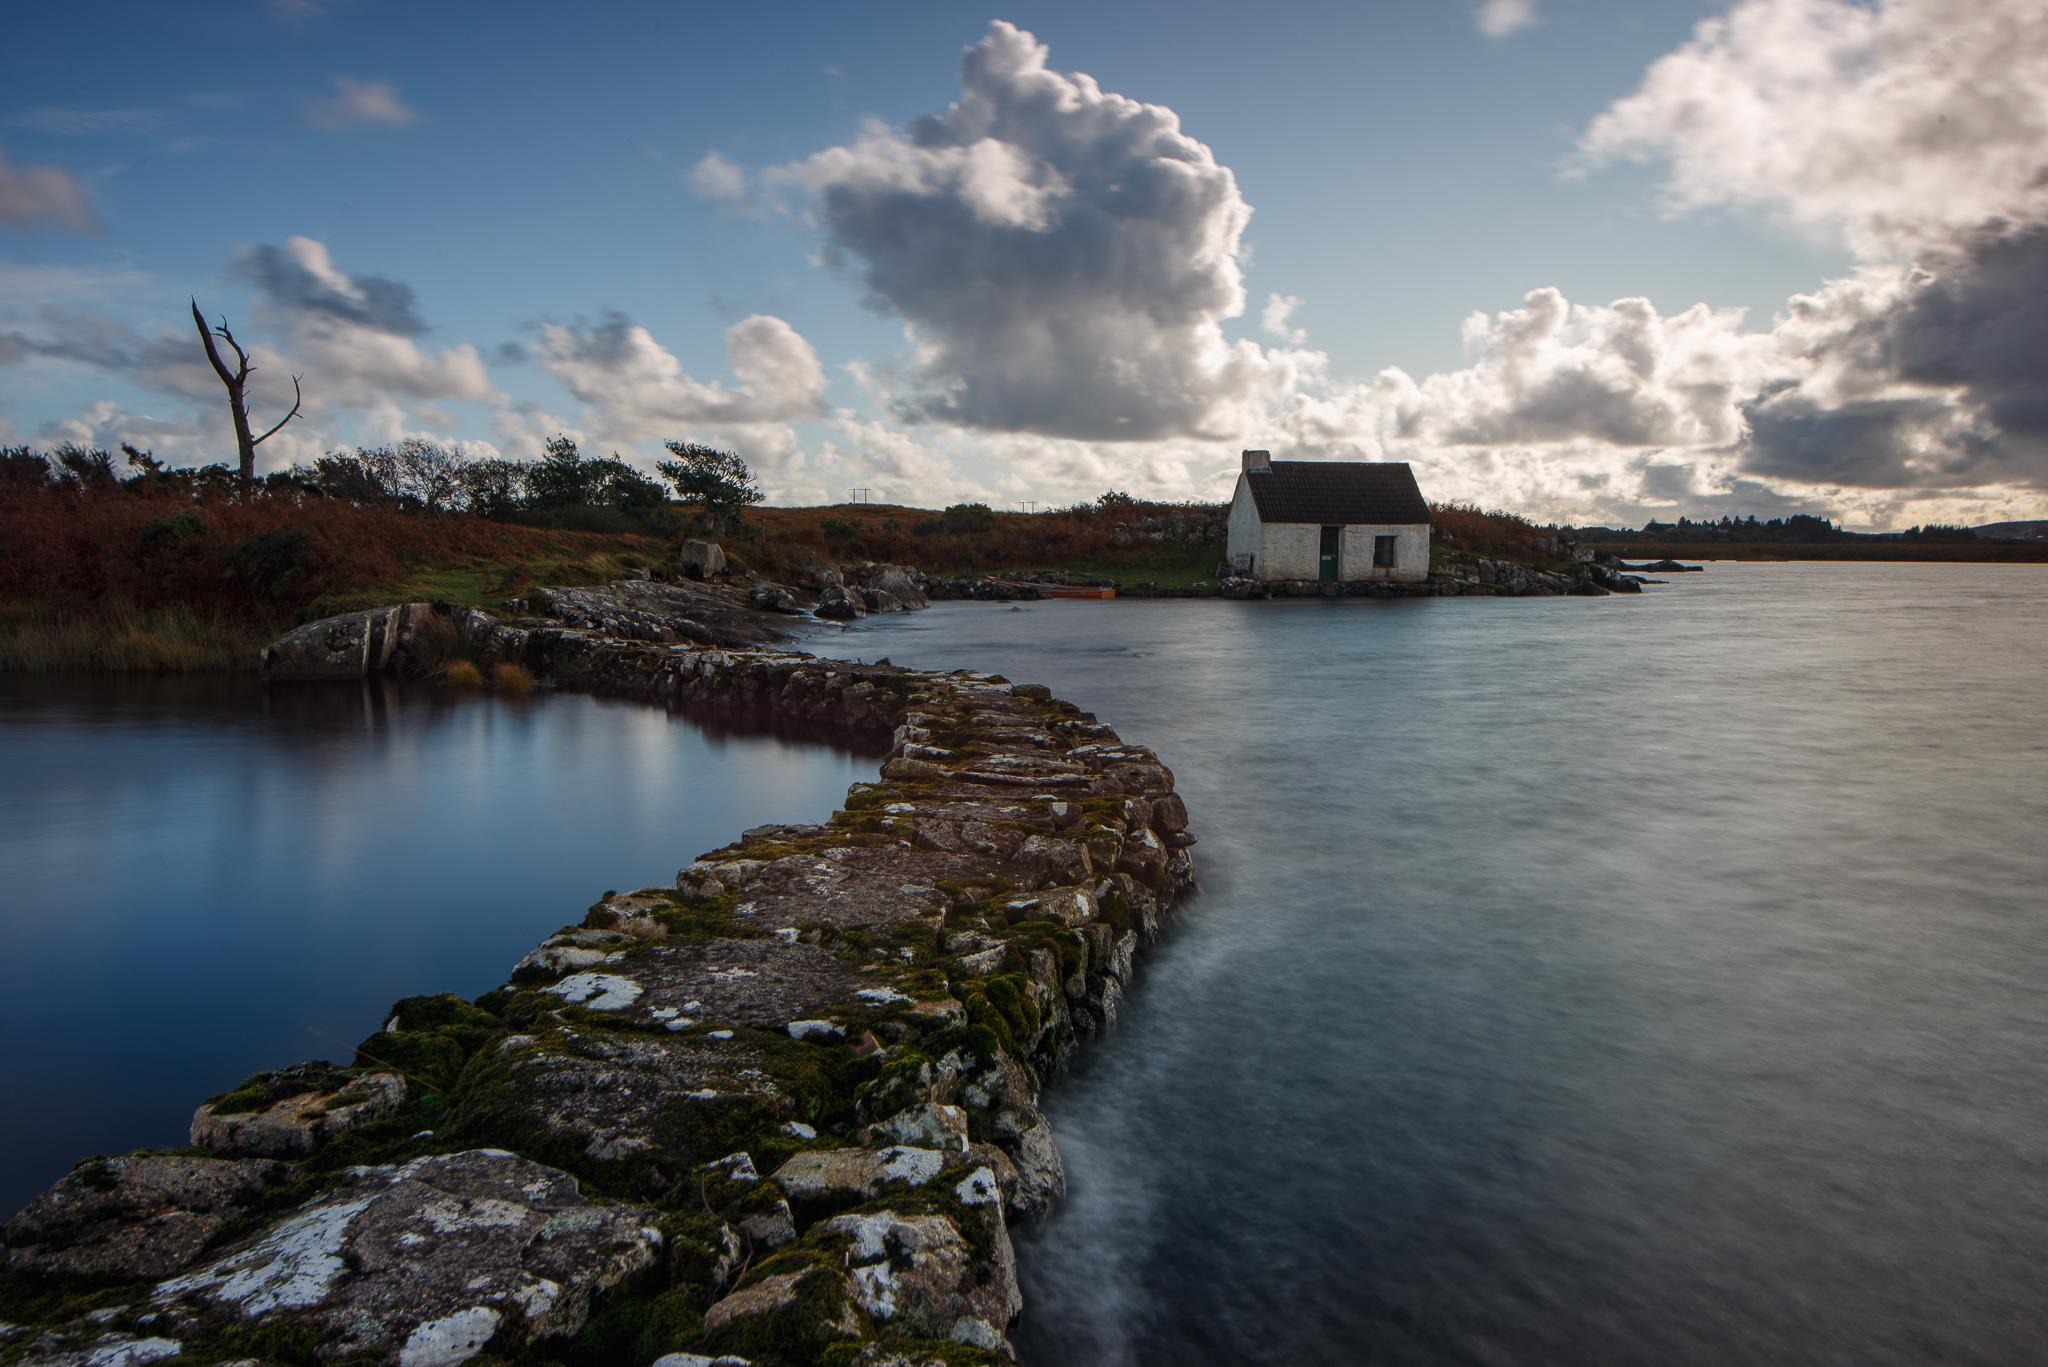 Fisherman house, Ireland